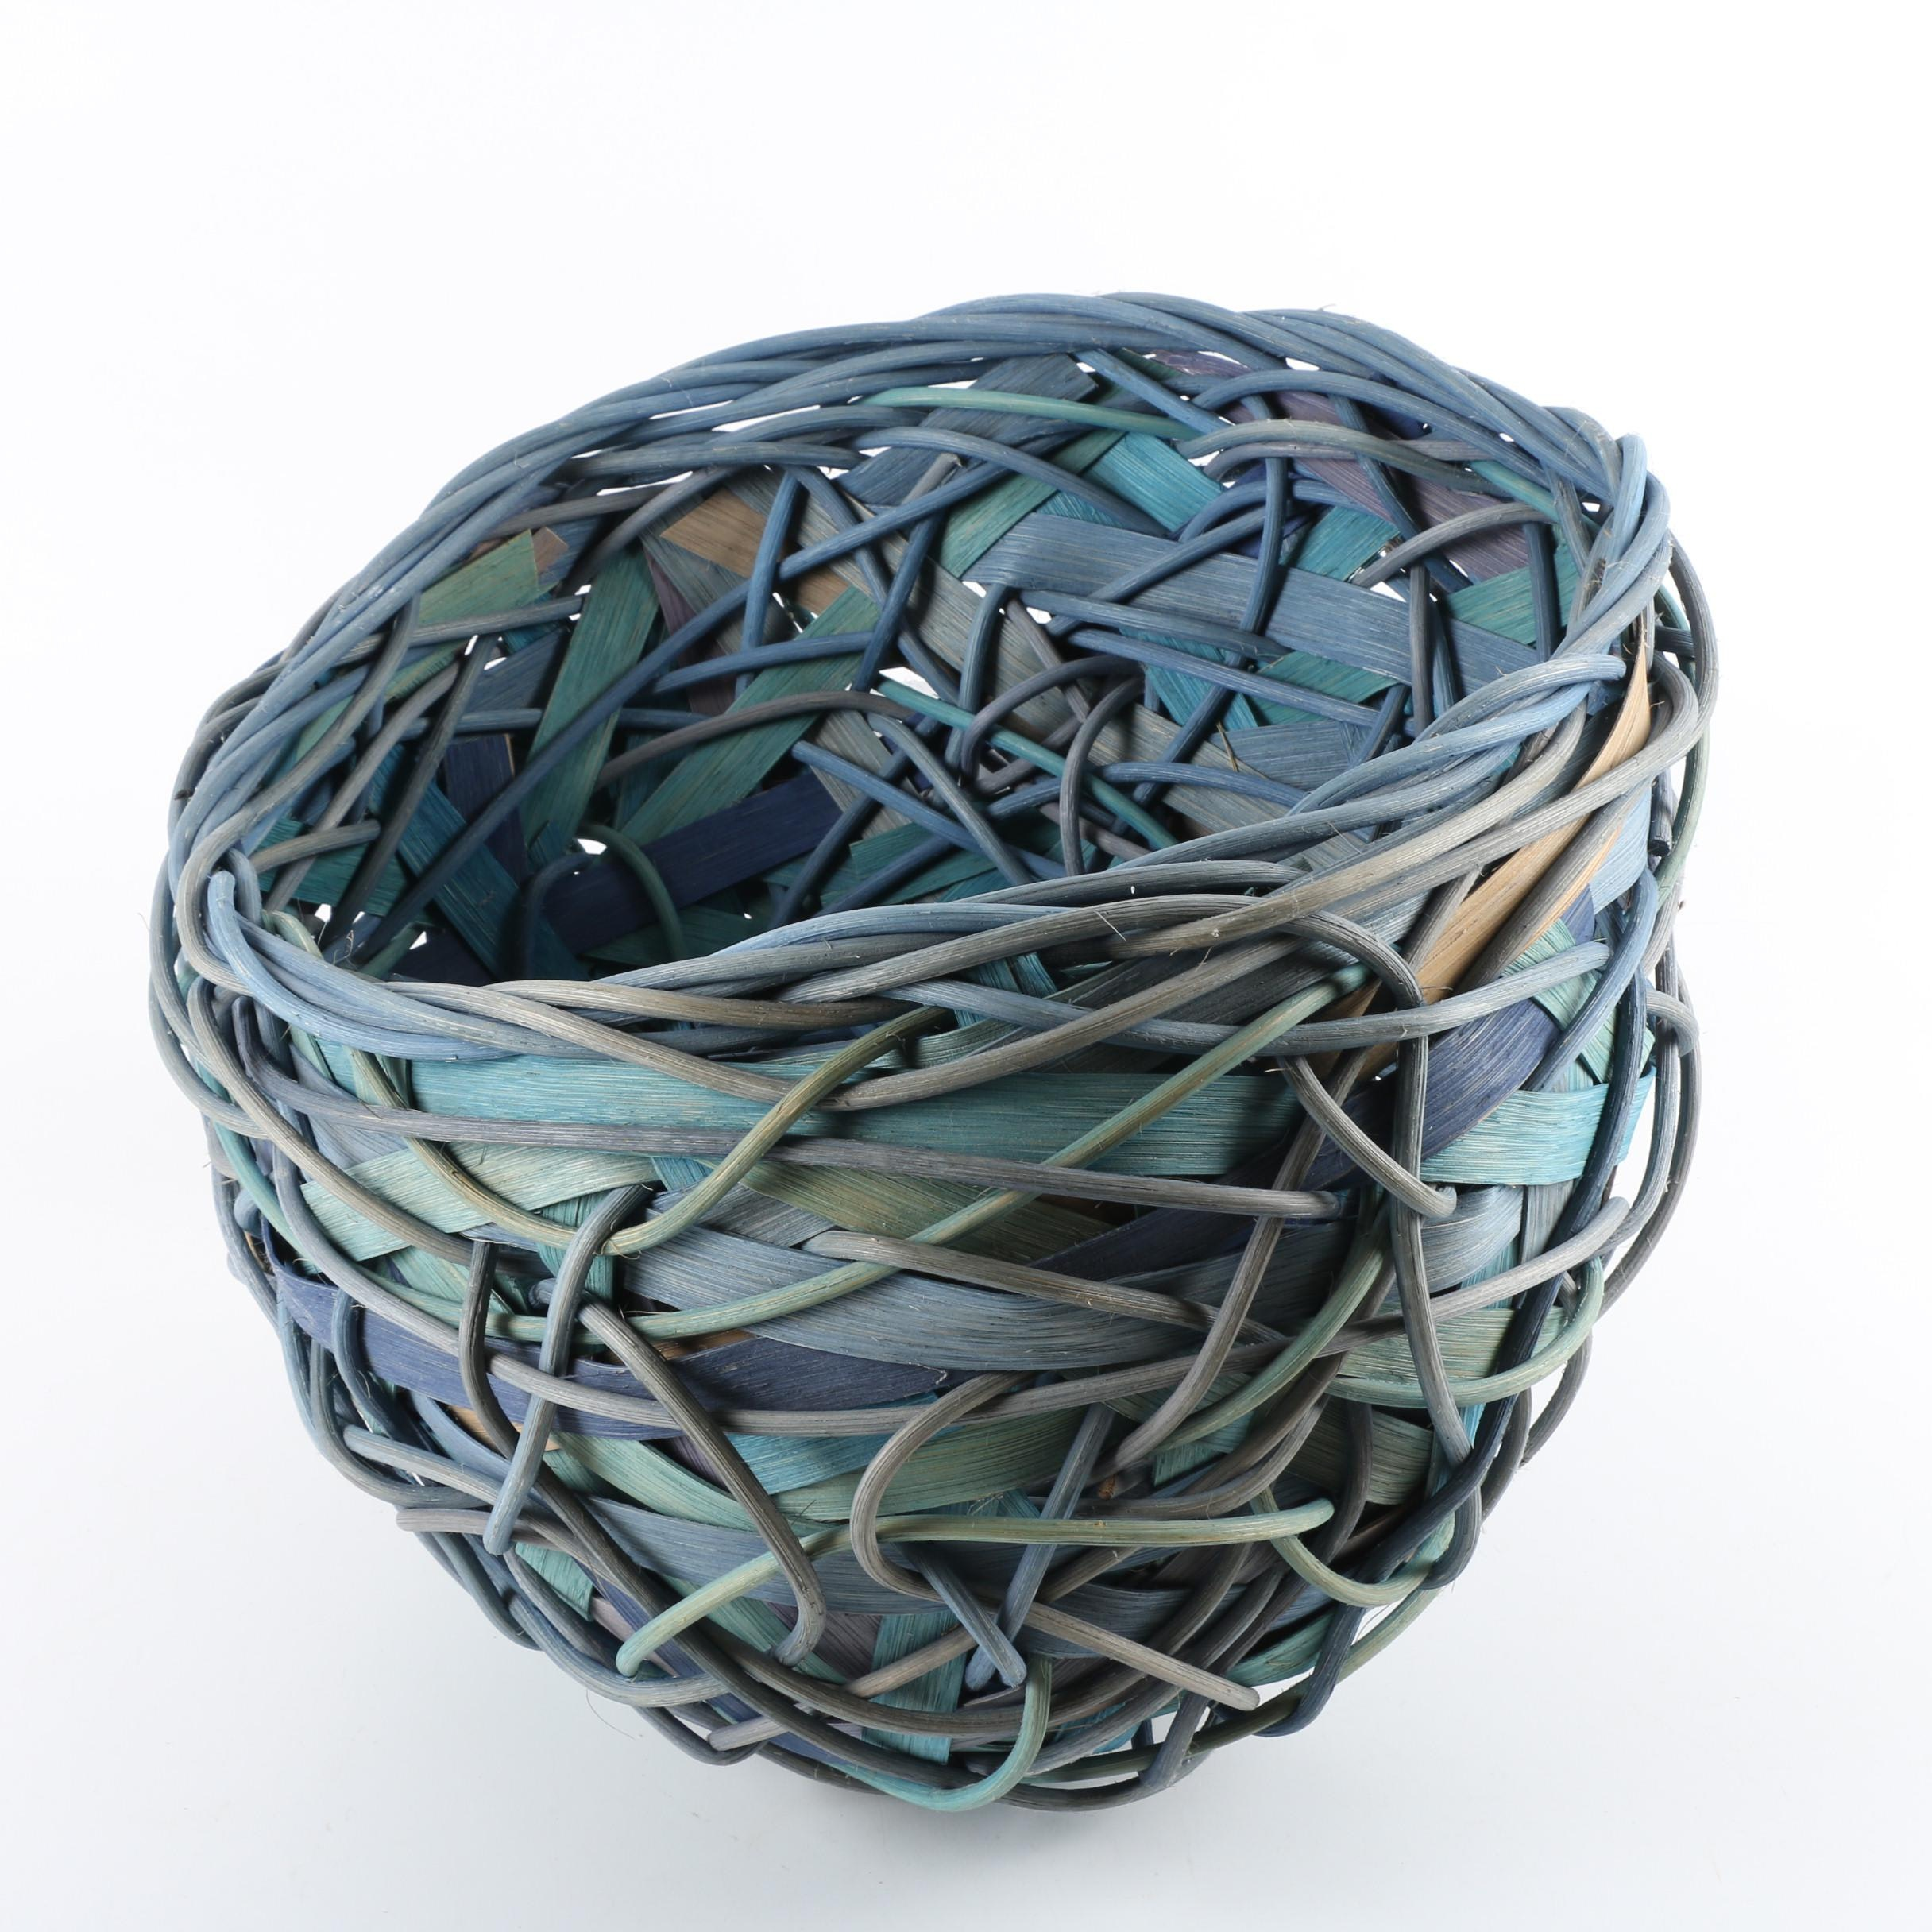 Dyed Woven Round Bird's Nest Form Basket